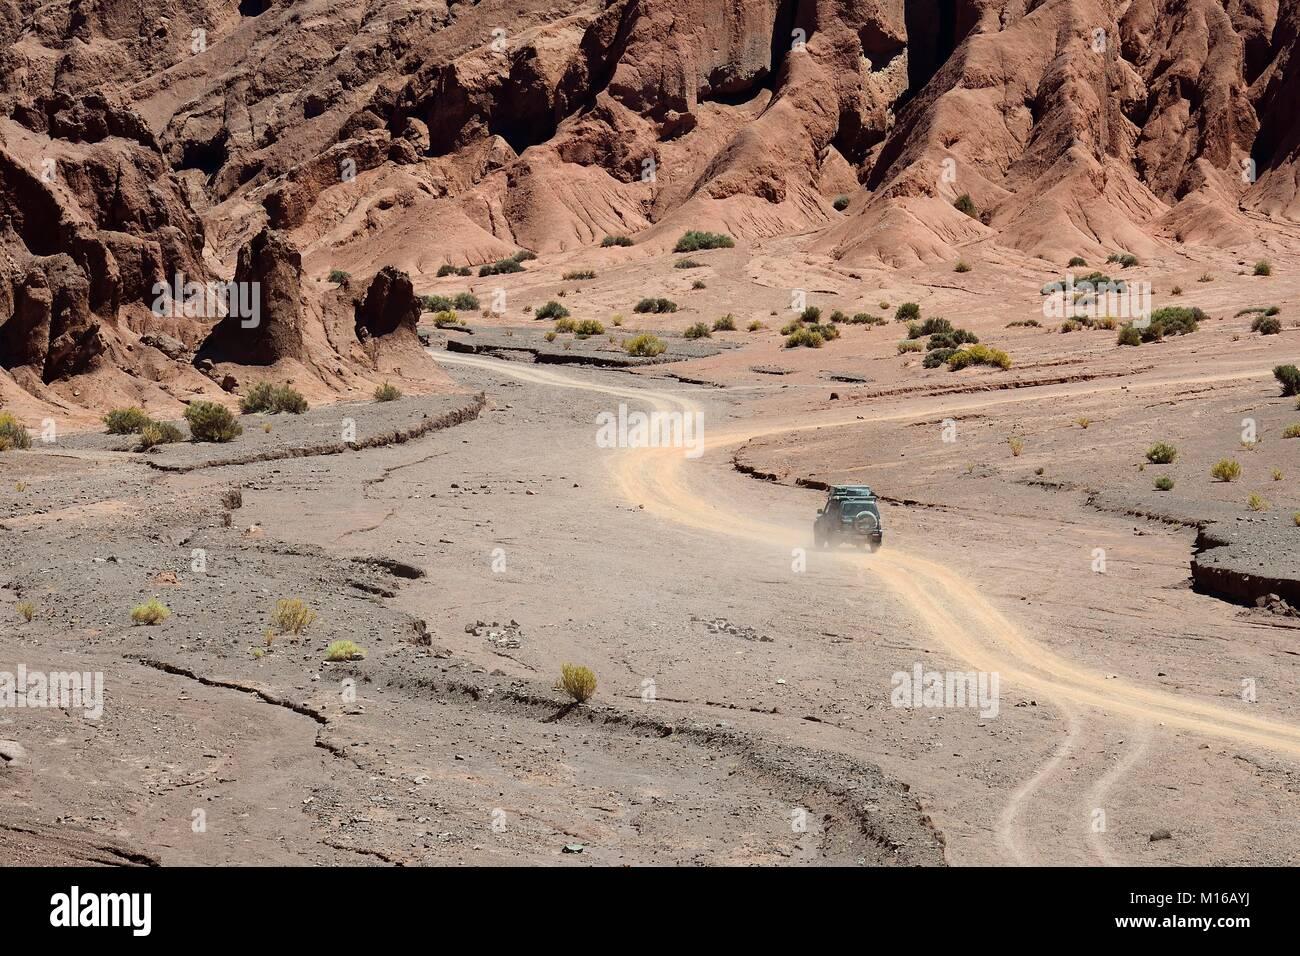 Desert landscape with dirt road in the Rainbow Valley, Valle Arcoiris, near San Pedro de Atacama, Región de - Stock Image